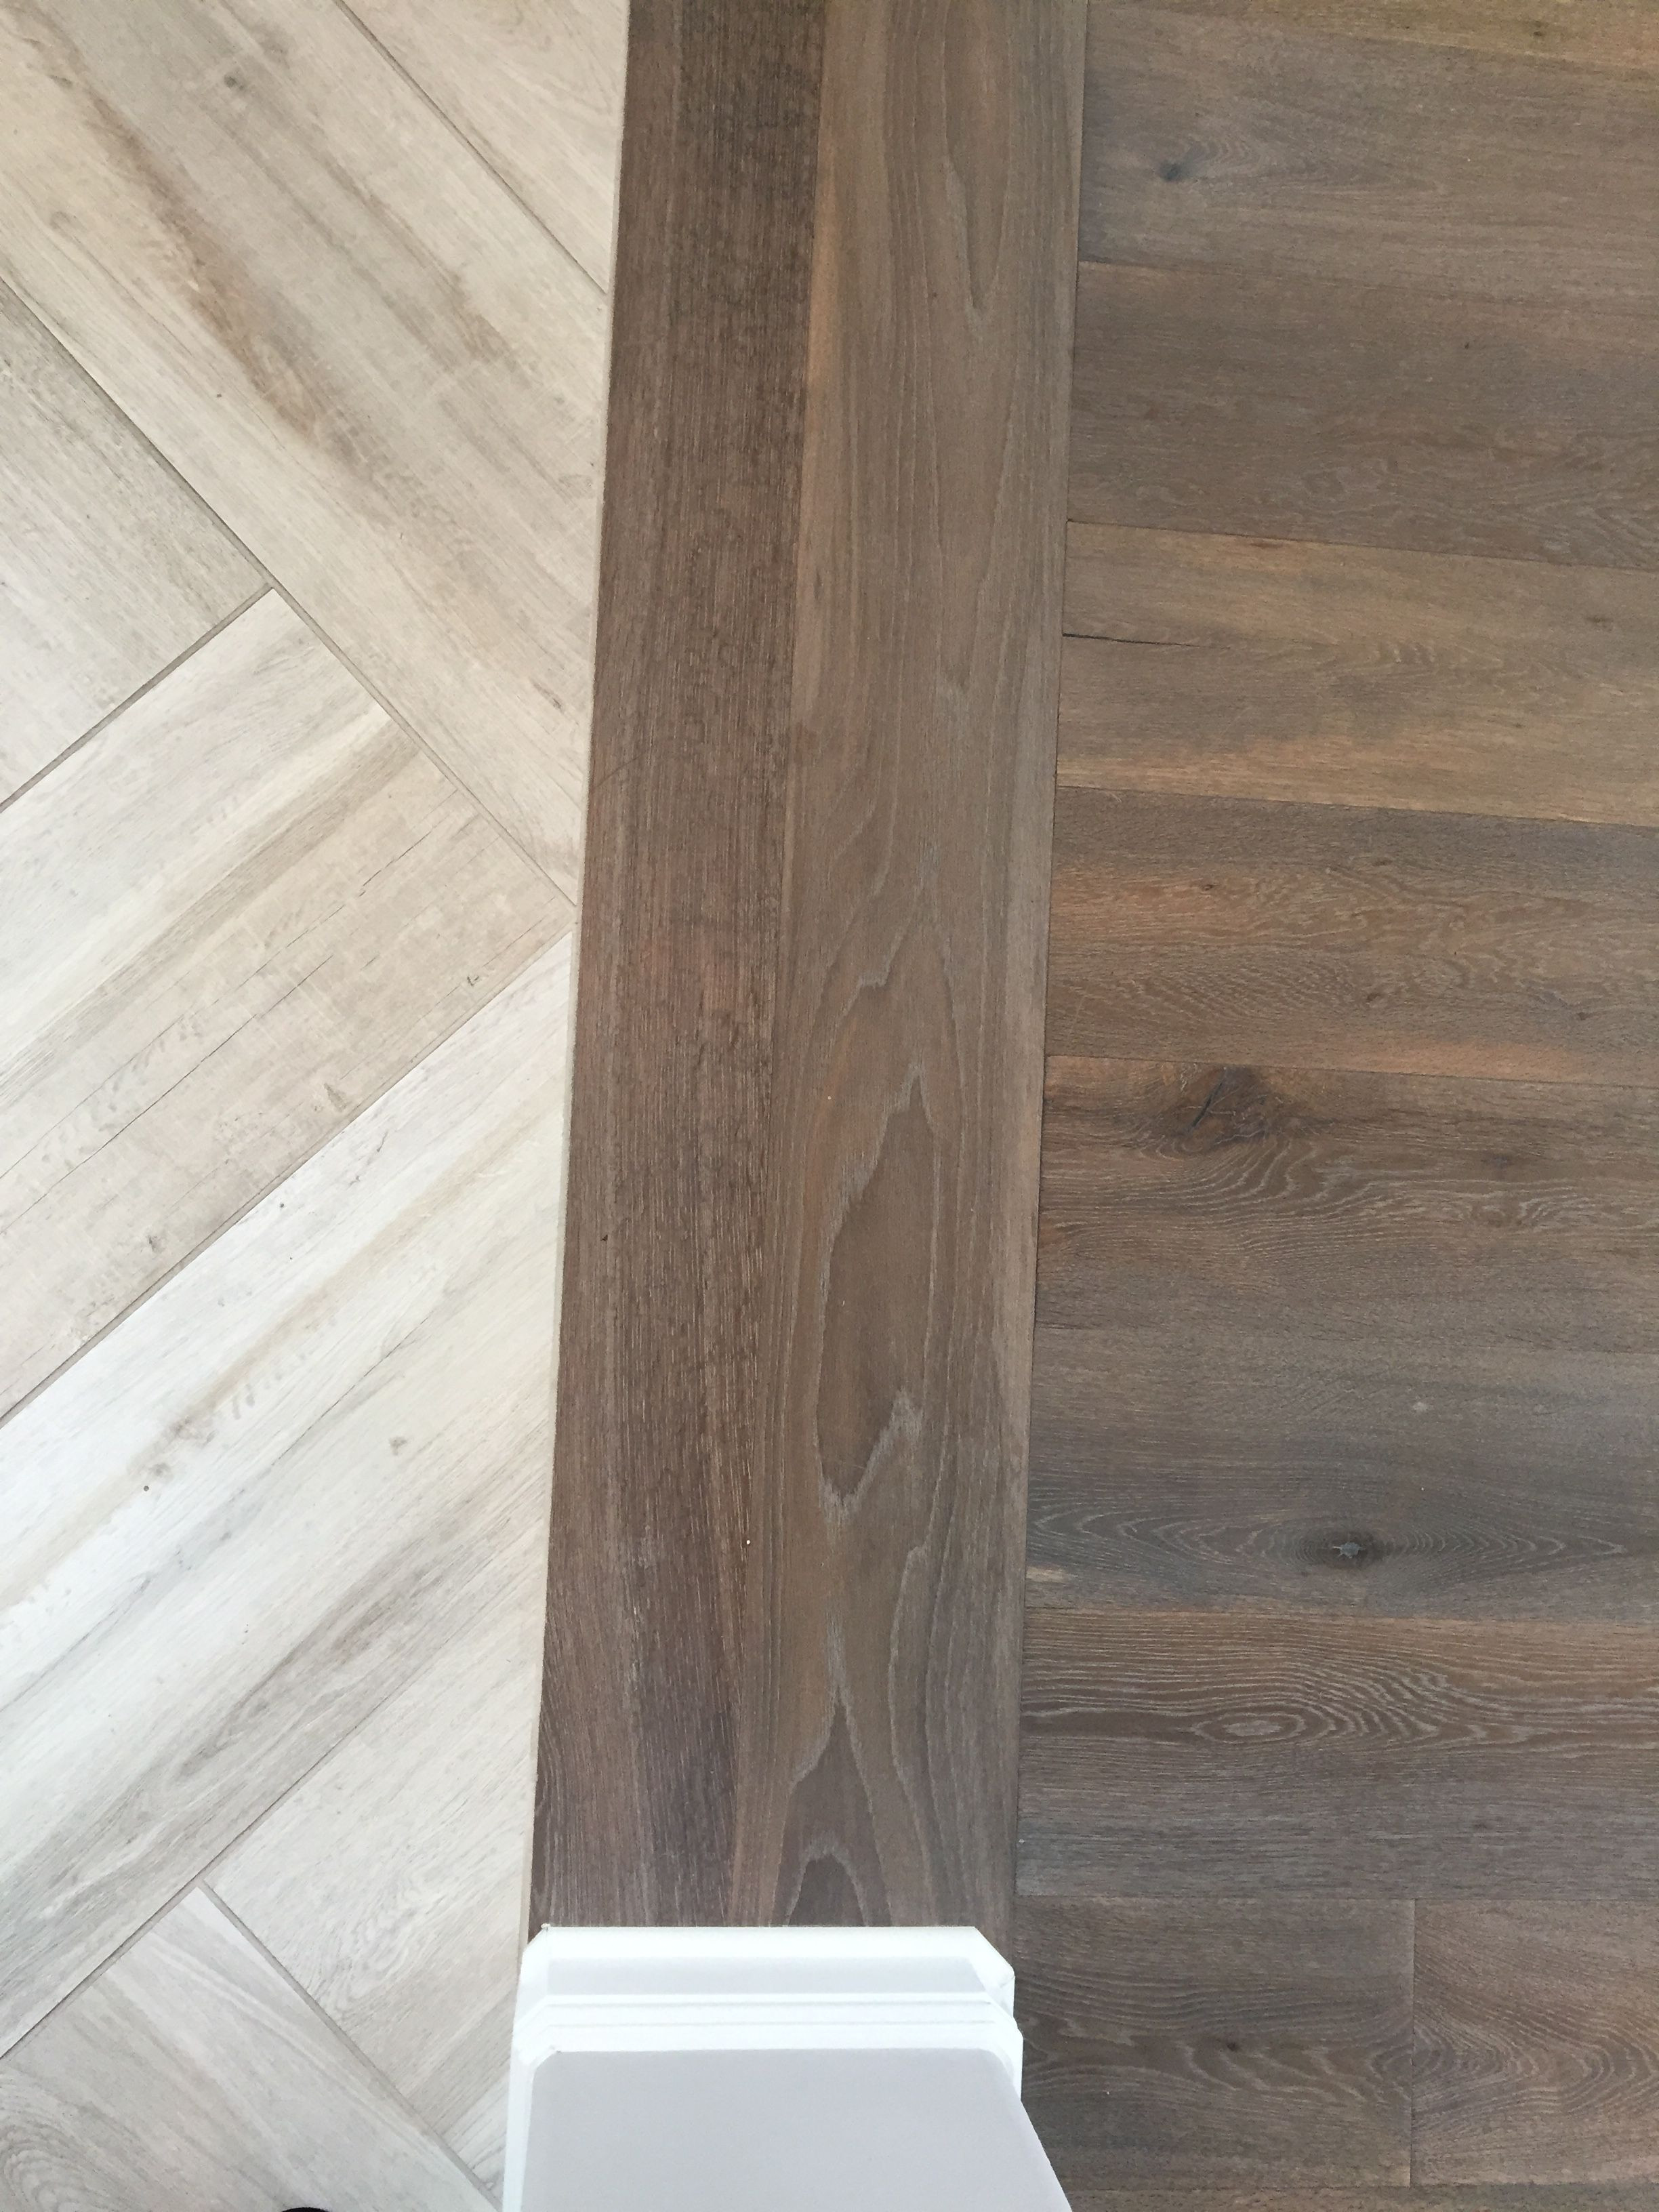 how to install herringbone hardwood floor of floor transition laminate to herringbone tile pattern model pertaining to floor transition laminate to herringbone tile pattern herringbone tile pattern herringbone wood floor